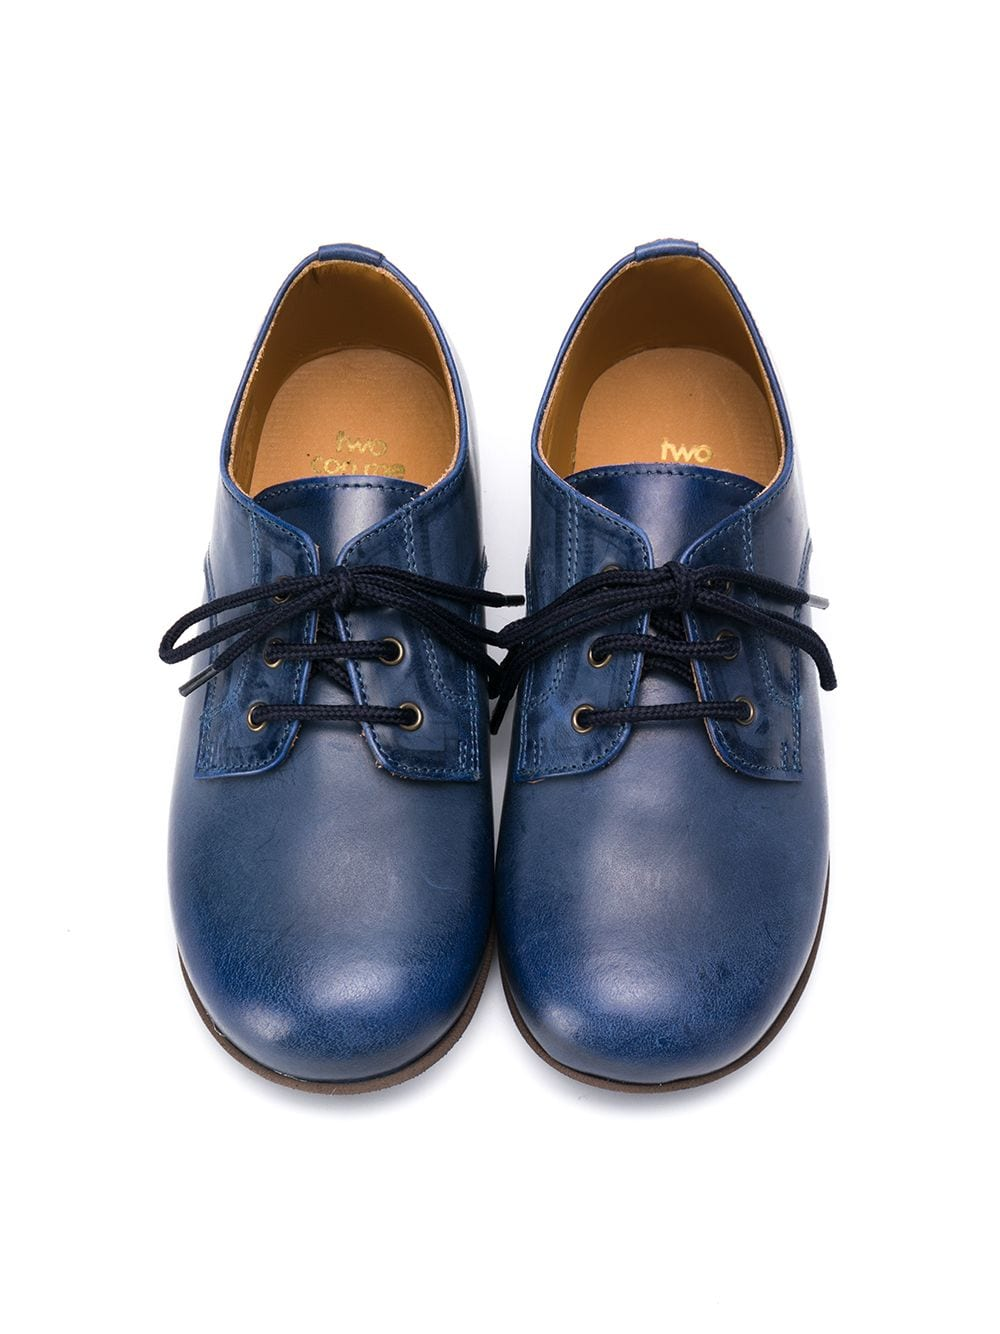 Pepe Kids | классические оксфорды | Clouty